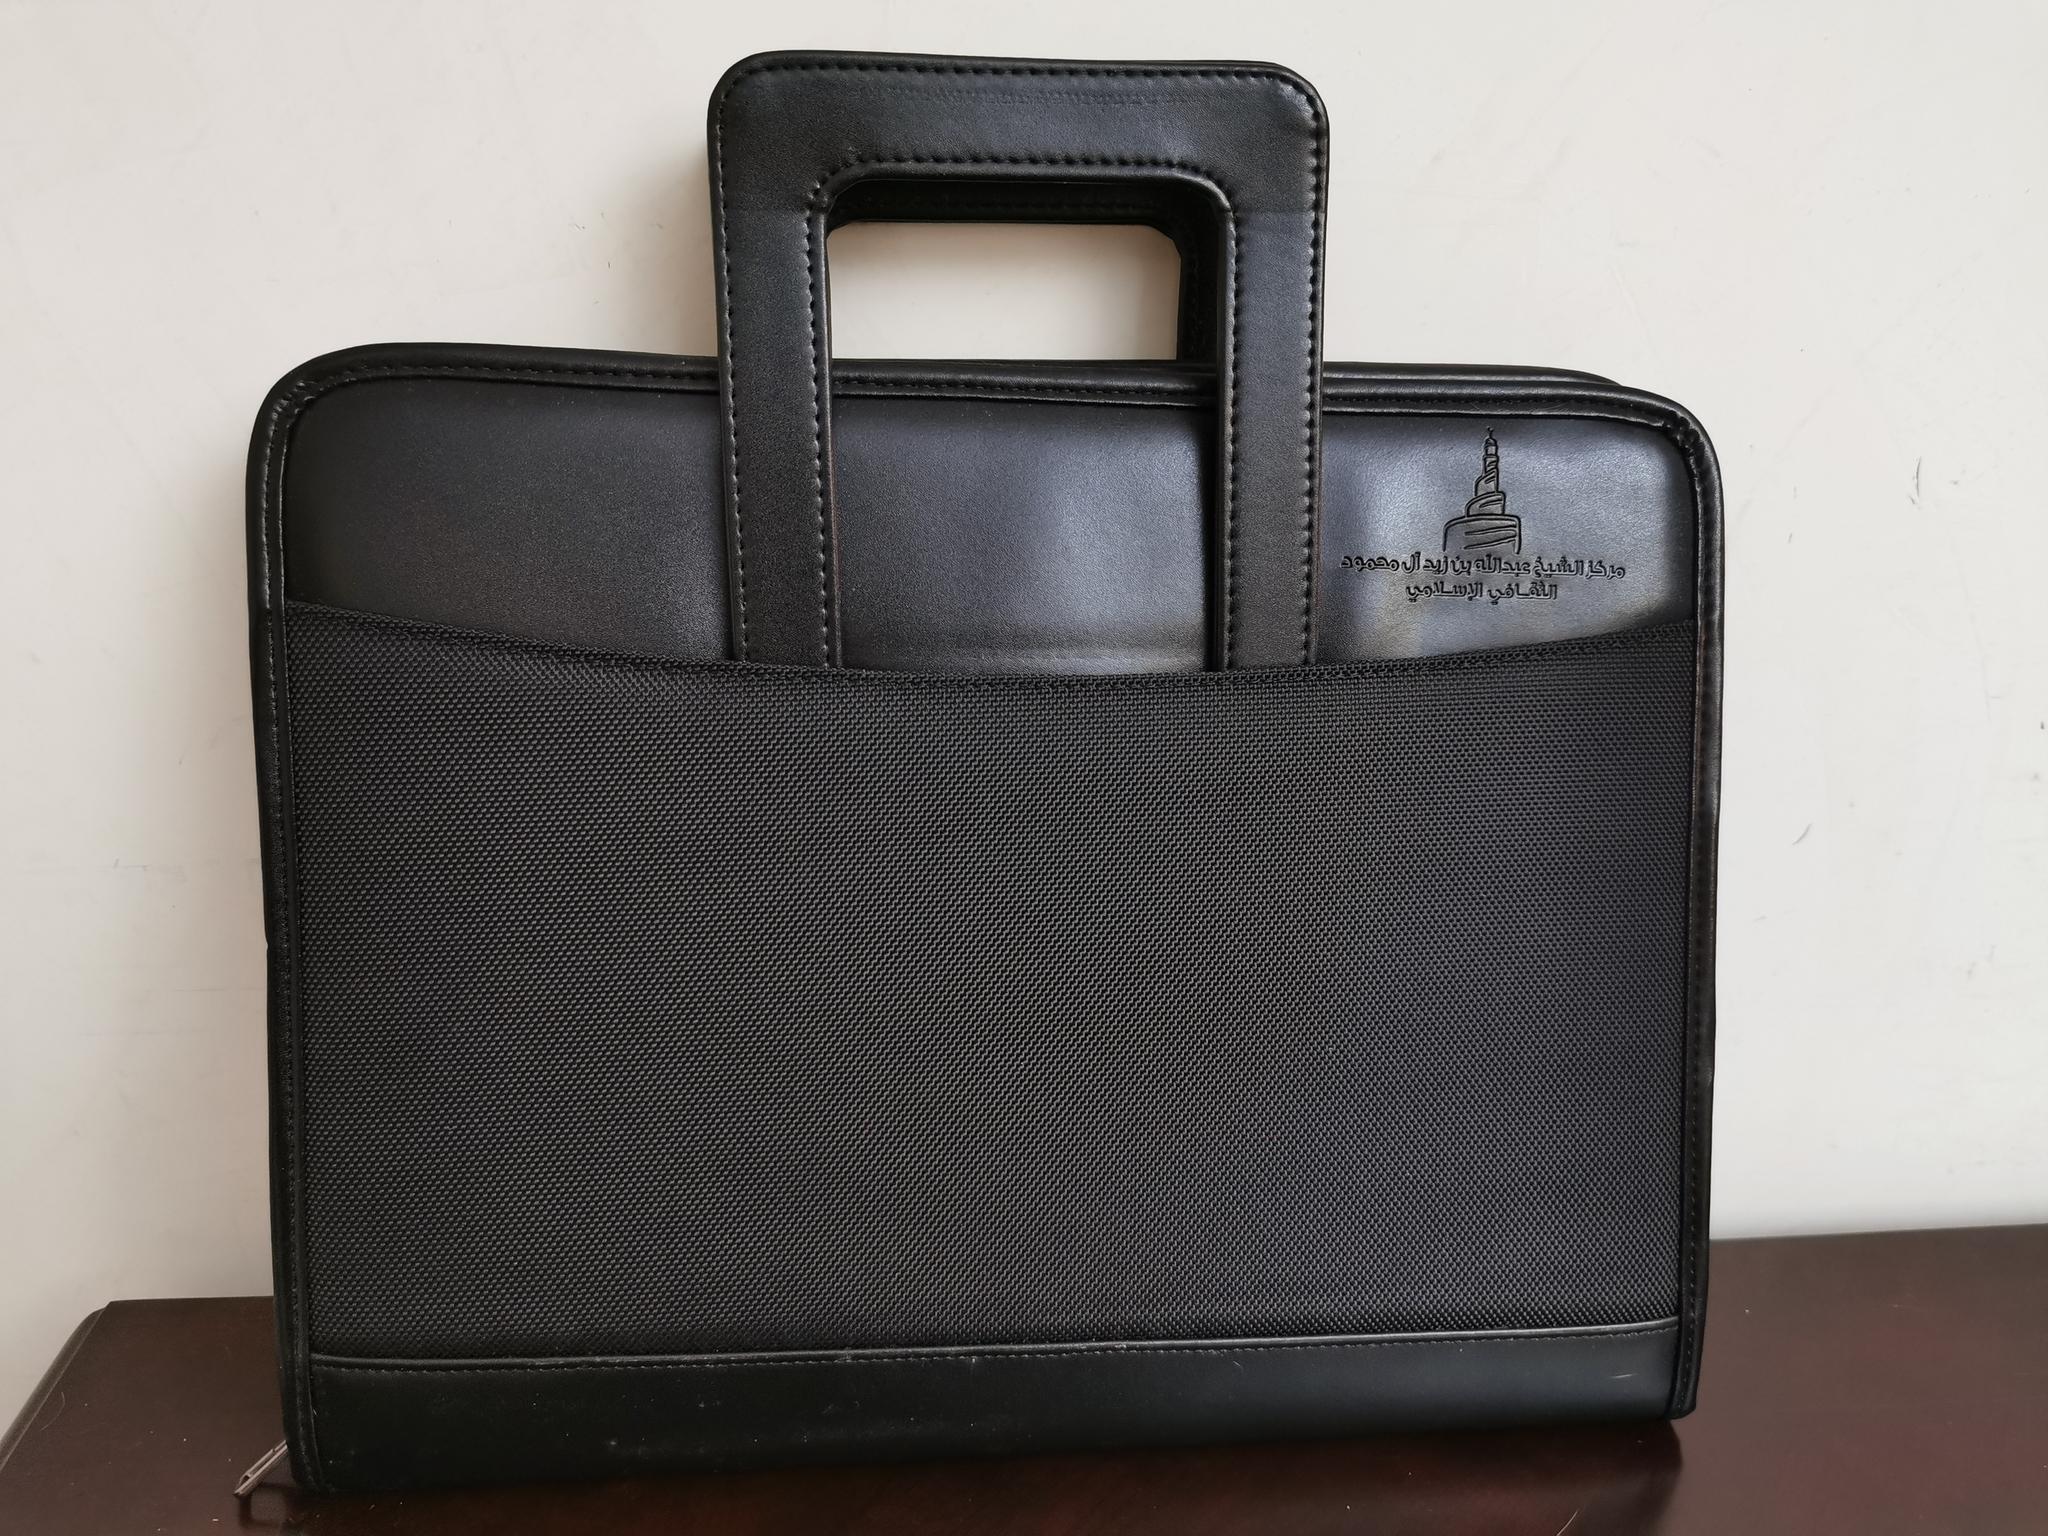 Executive Bag (NEW)